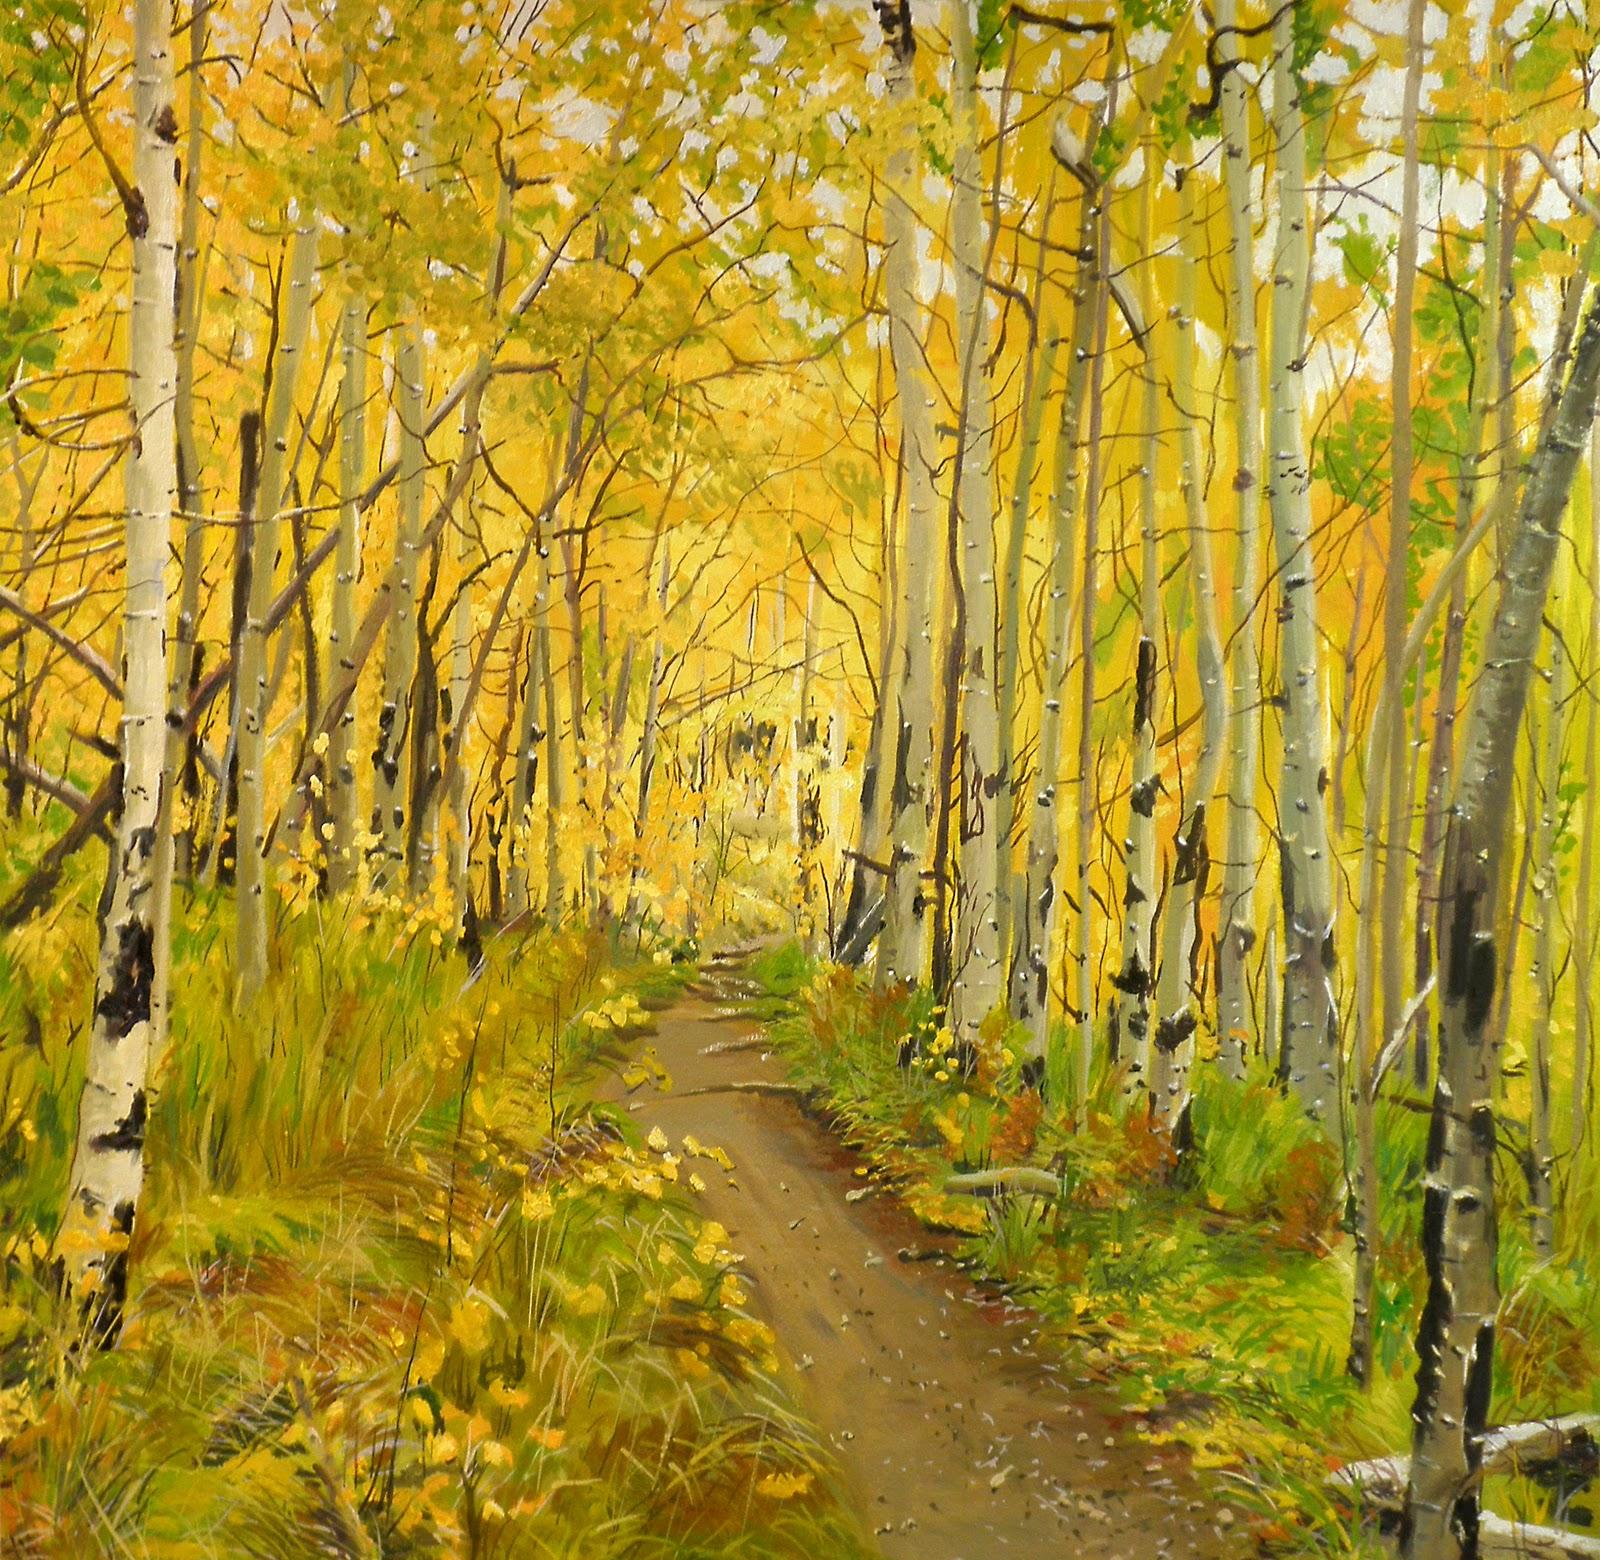 Paintings By Daniel Fishback Landscape Painting Kenosha